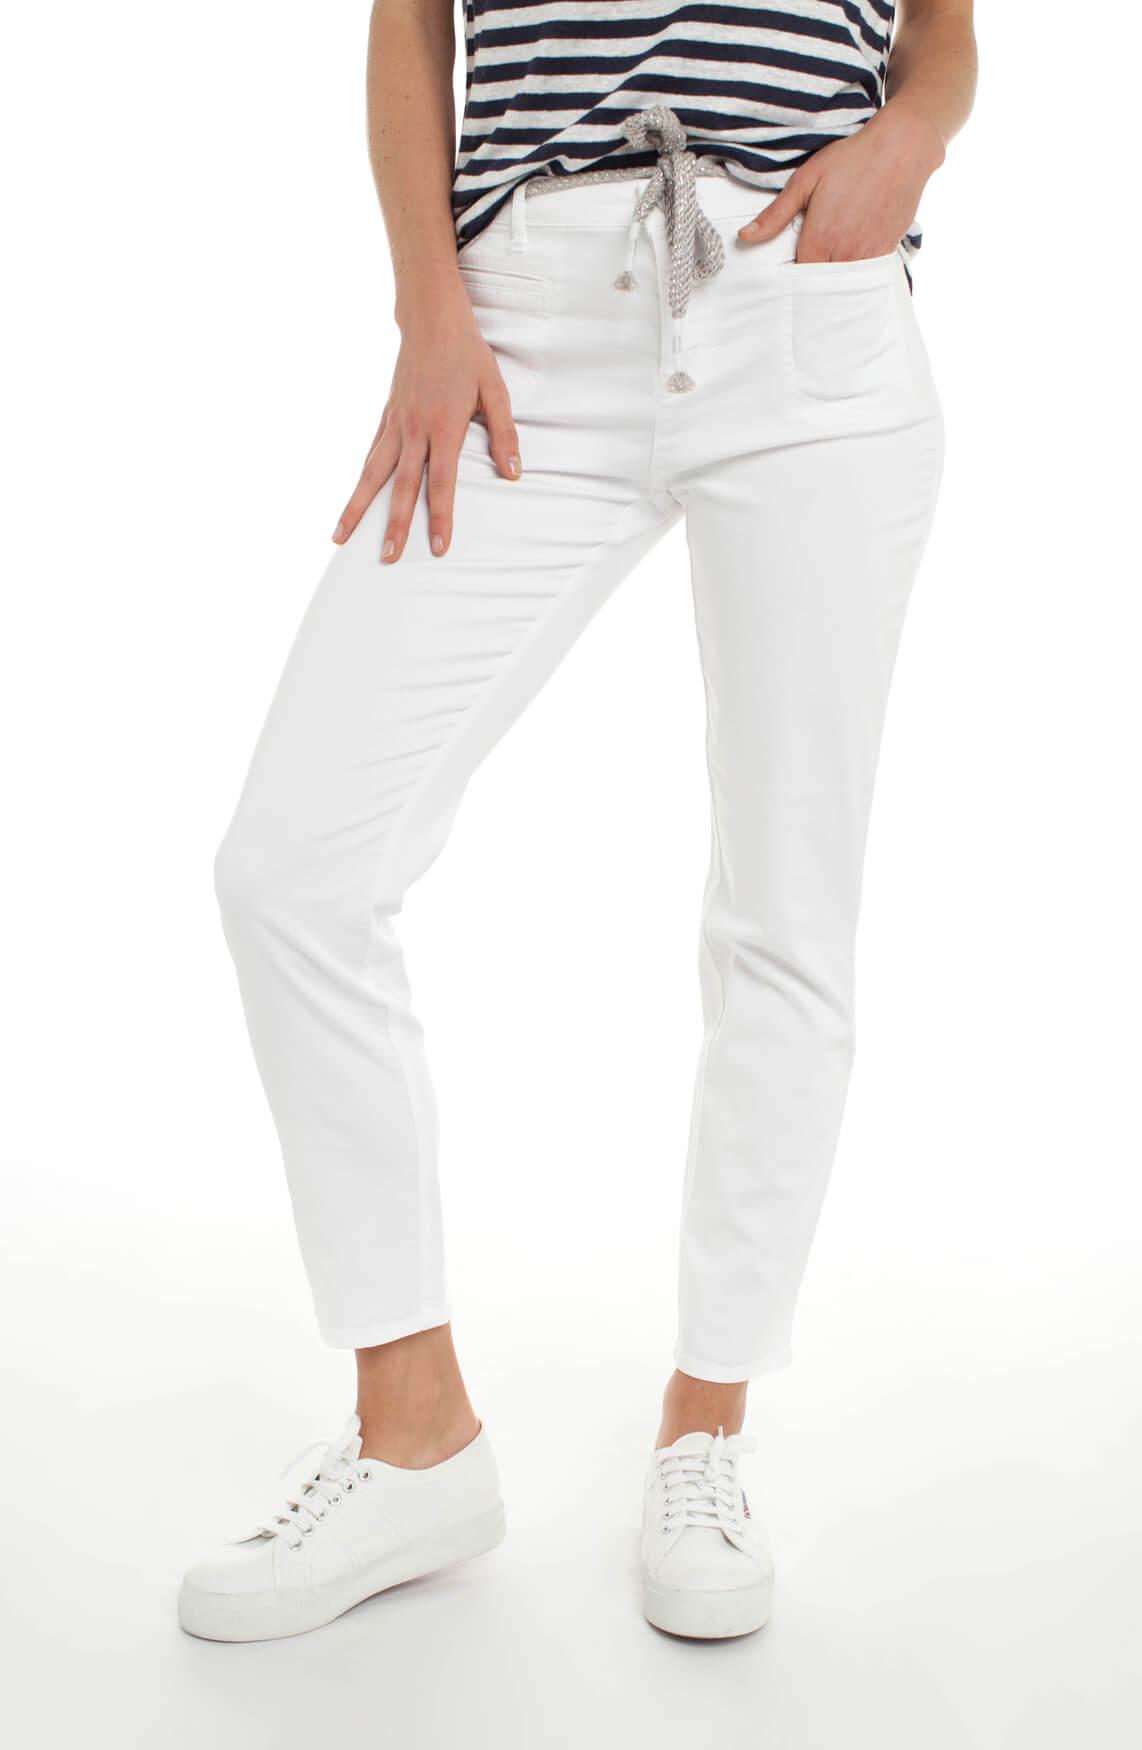 Rosner Dames Alisa broek met glitter ceintuur wit